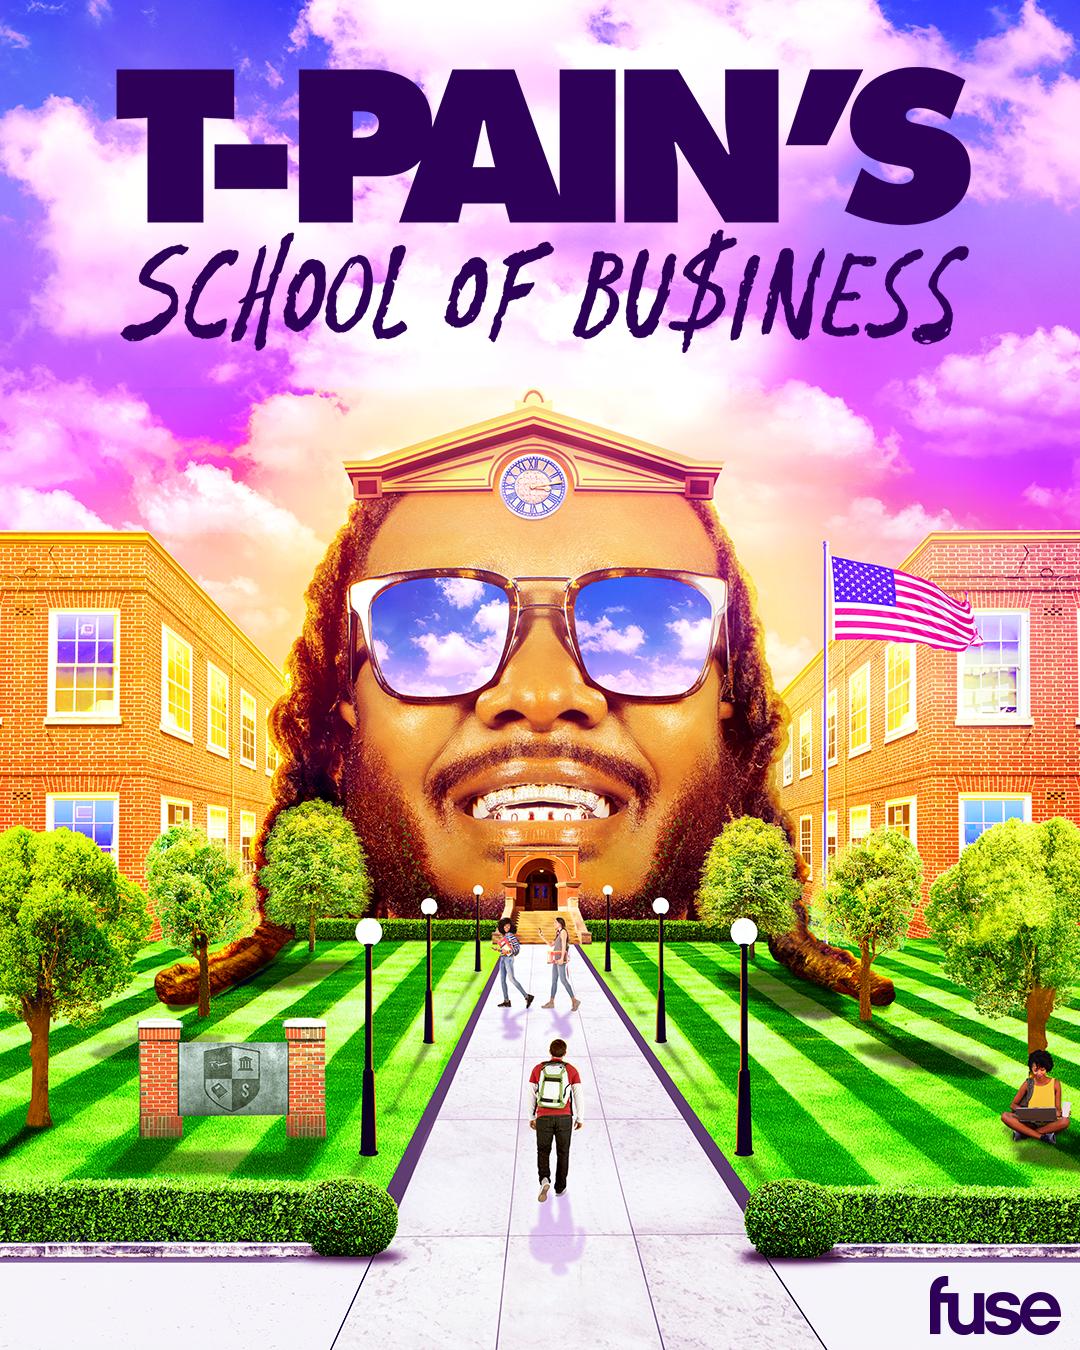 T-PAINS School of Business - FuseTV Season 2 Key ArtCreative Direction: David Salazar